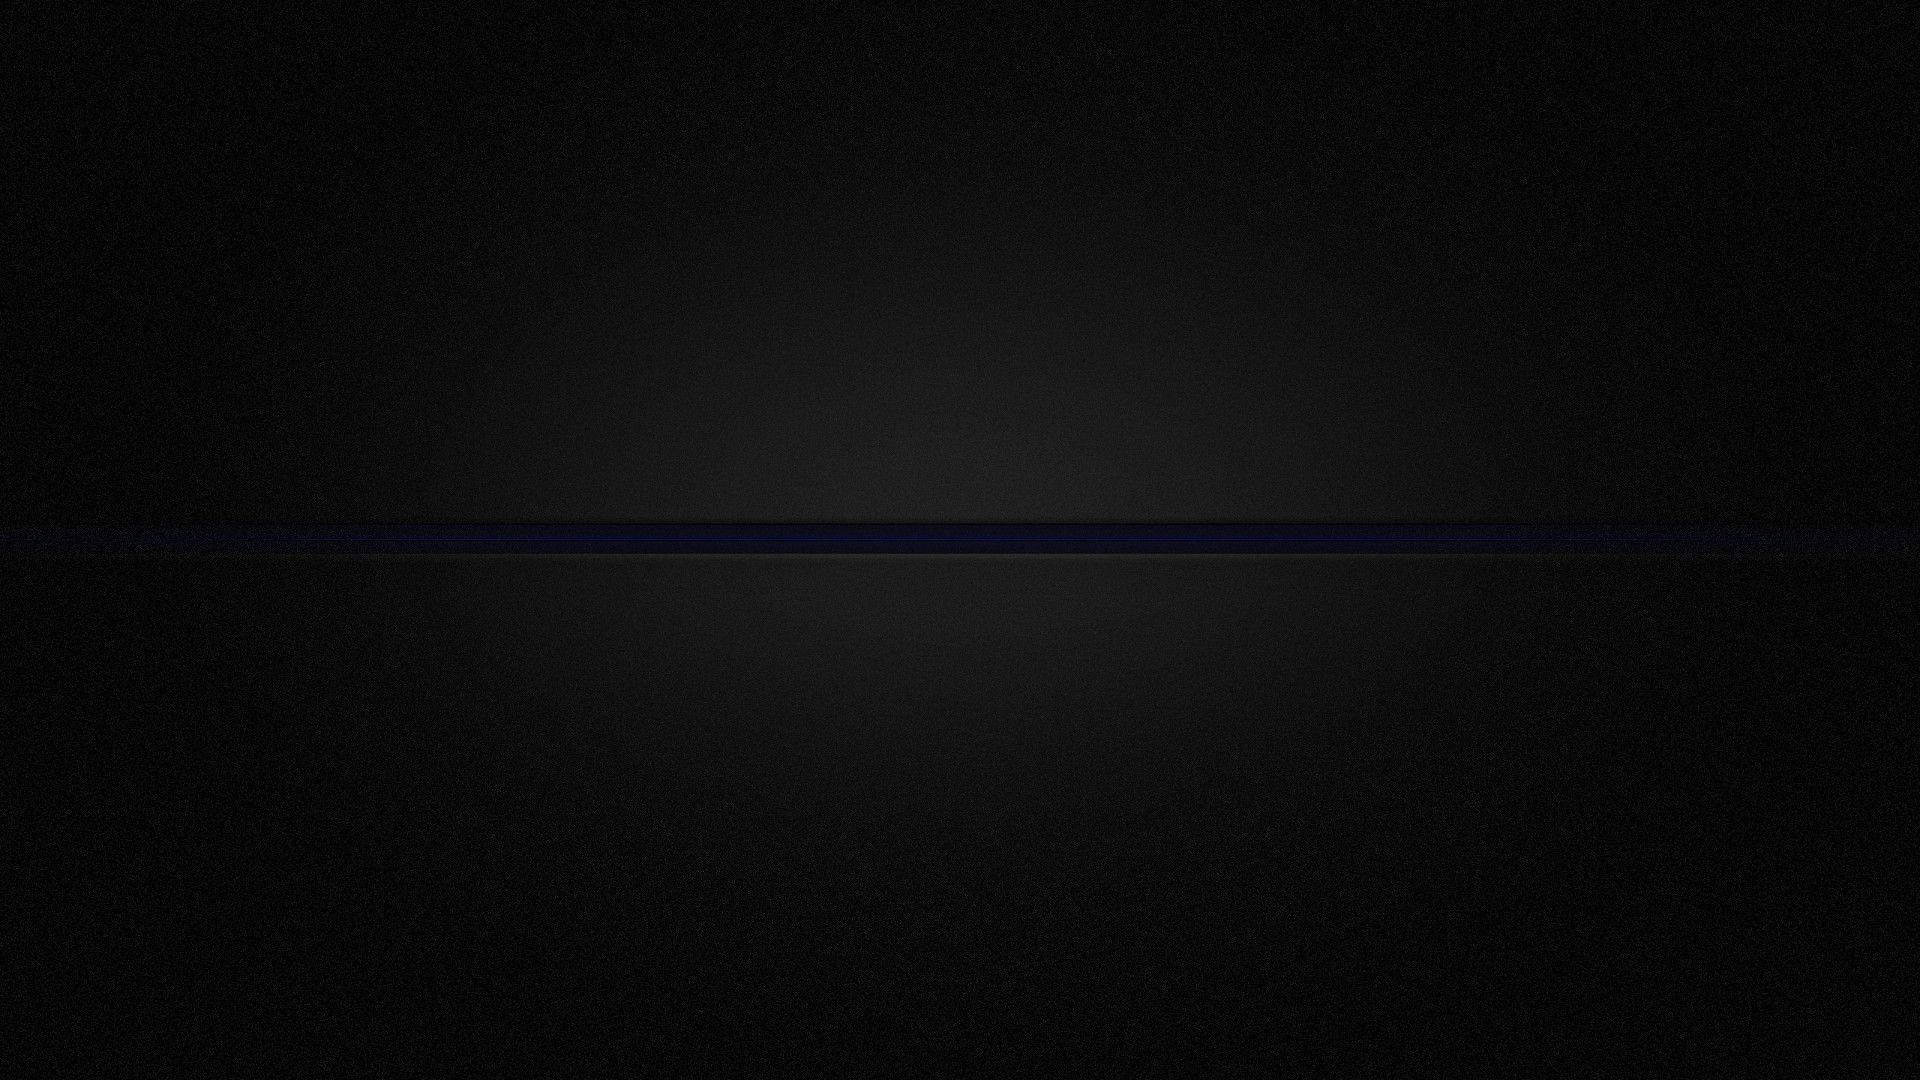 Dark Windows 10 Wallpaper (76+ images)